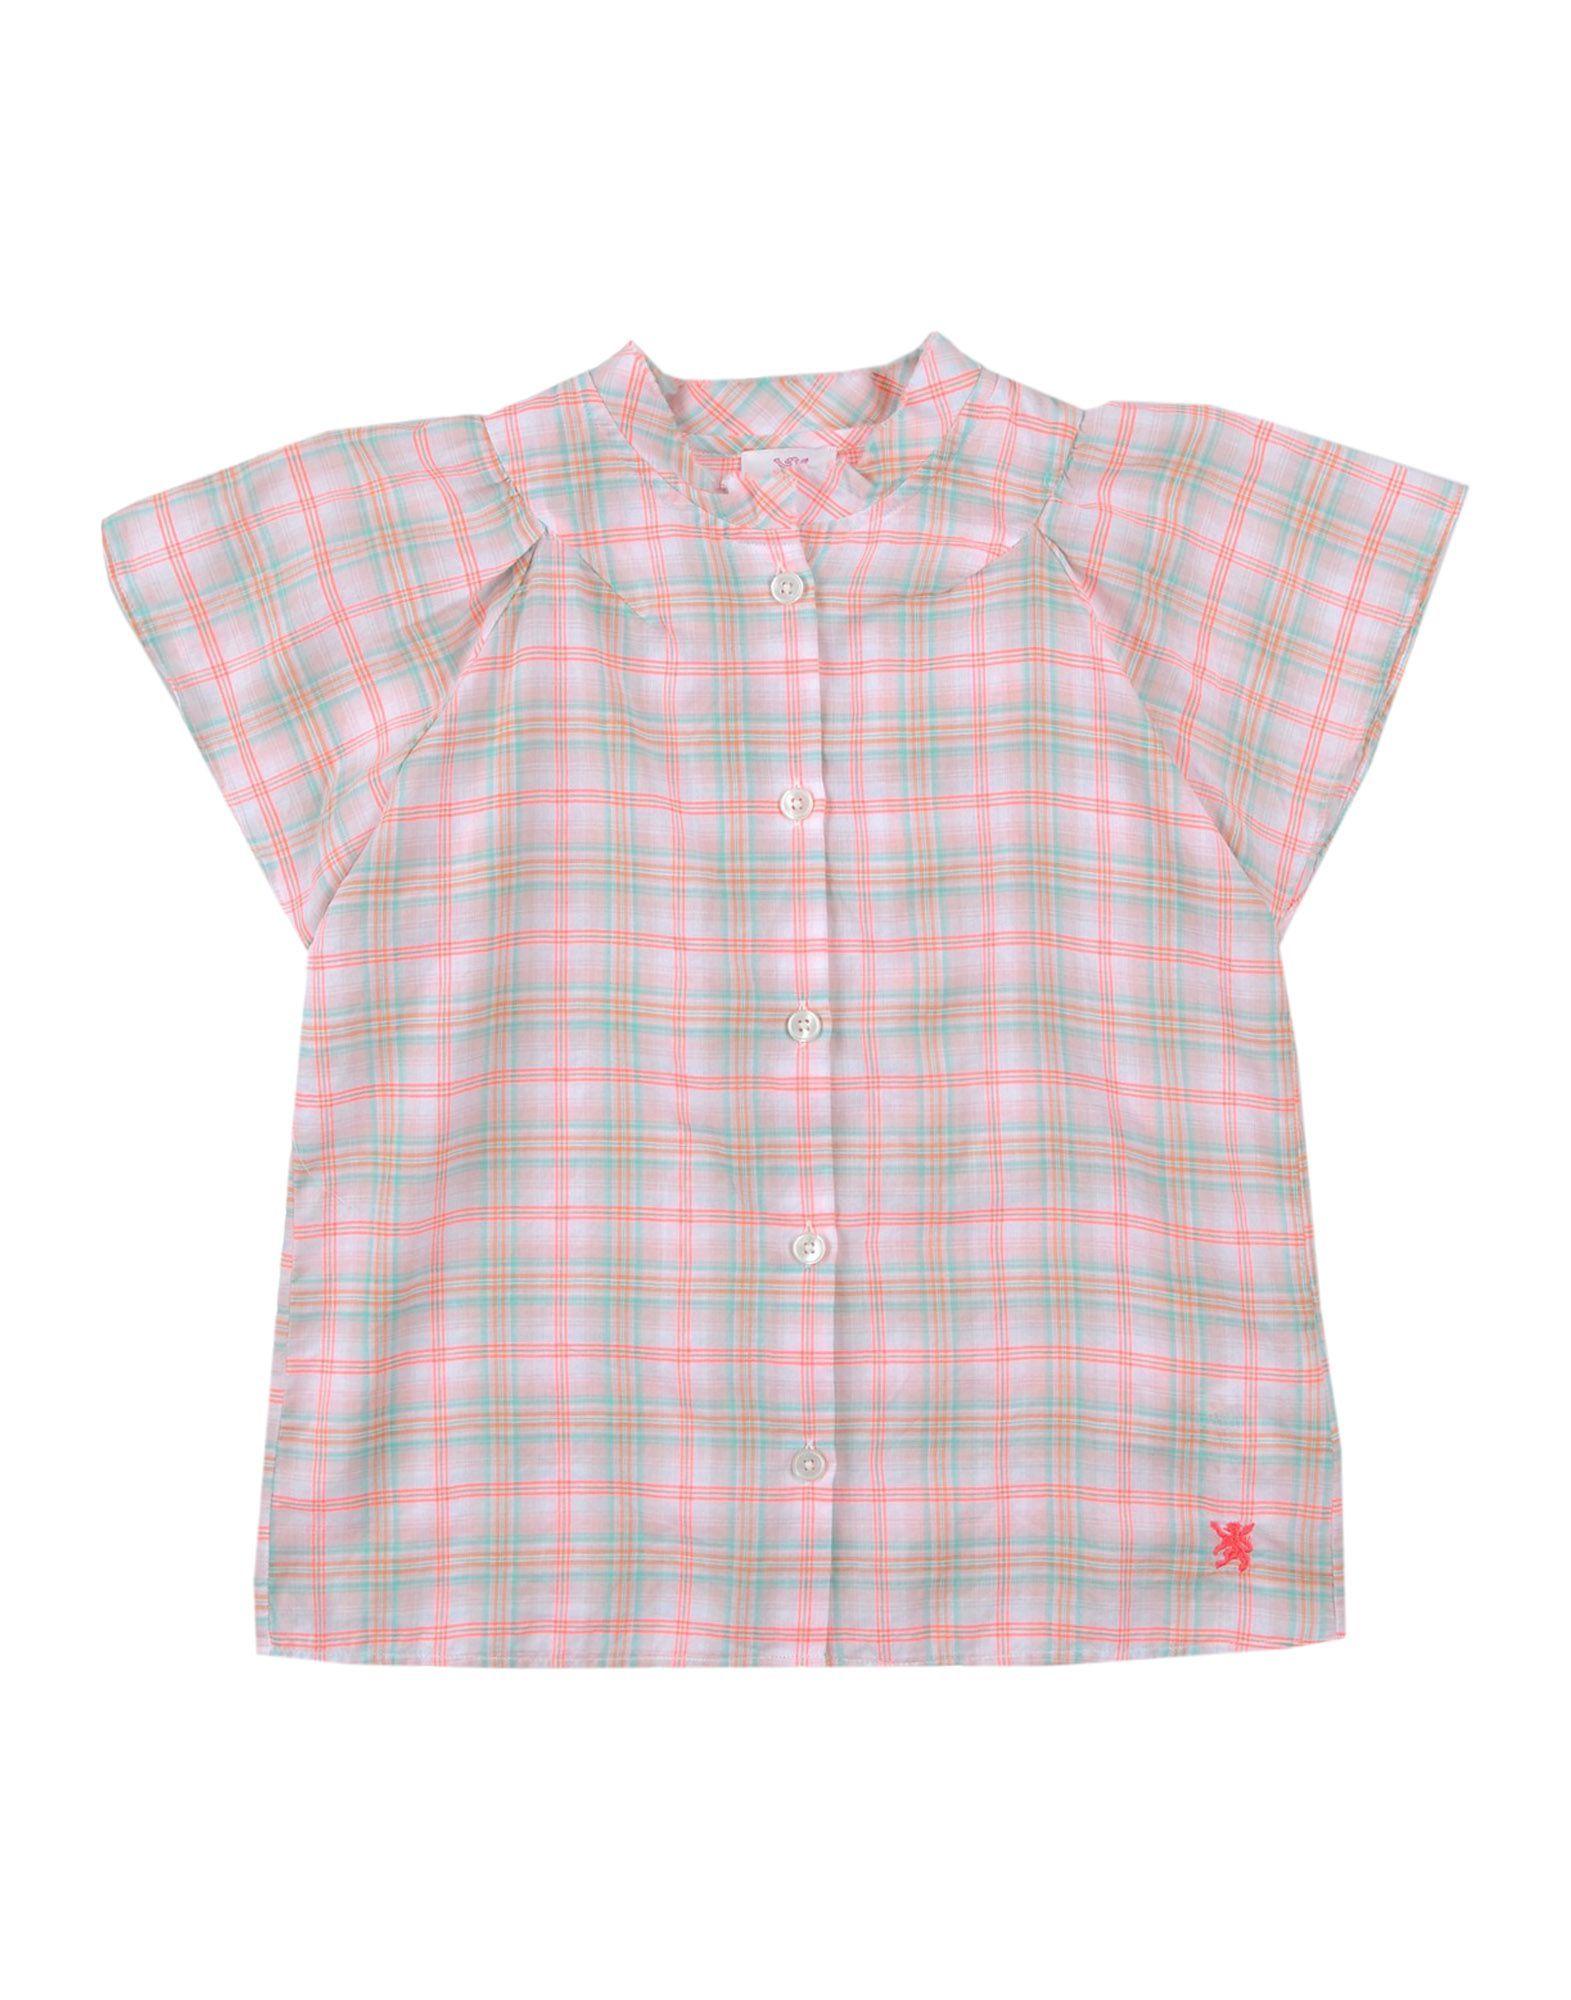 Mauro Grifoni Light Pink Cotton Shirt